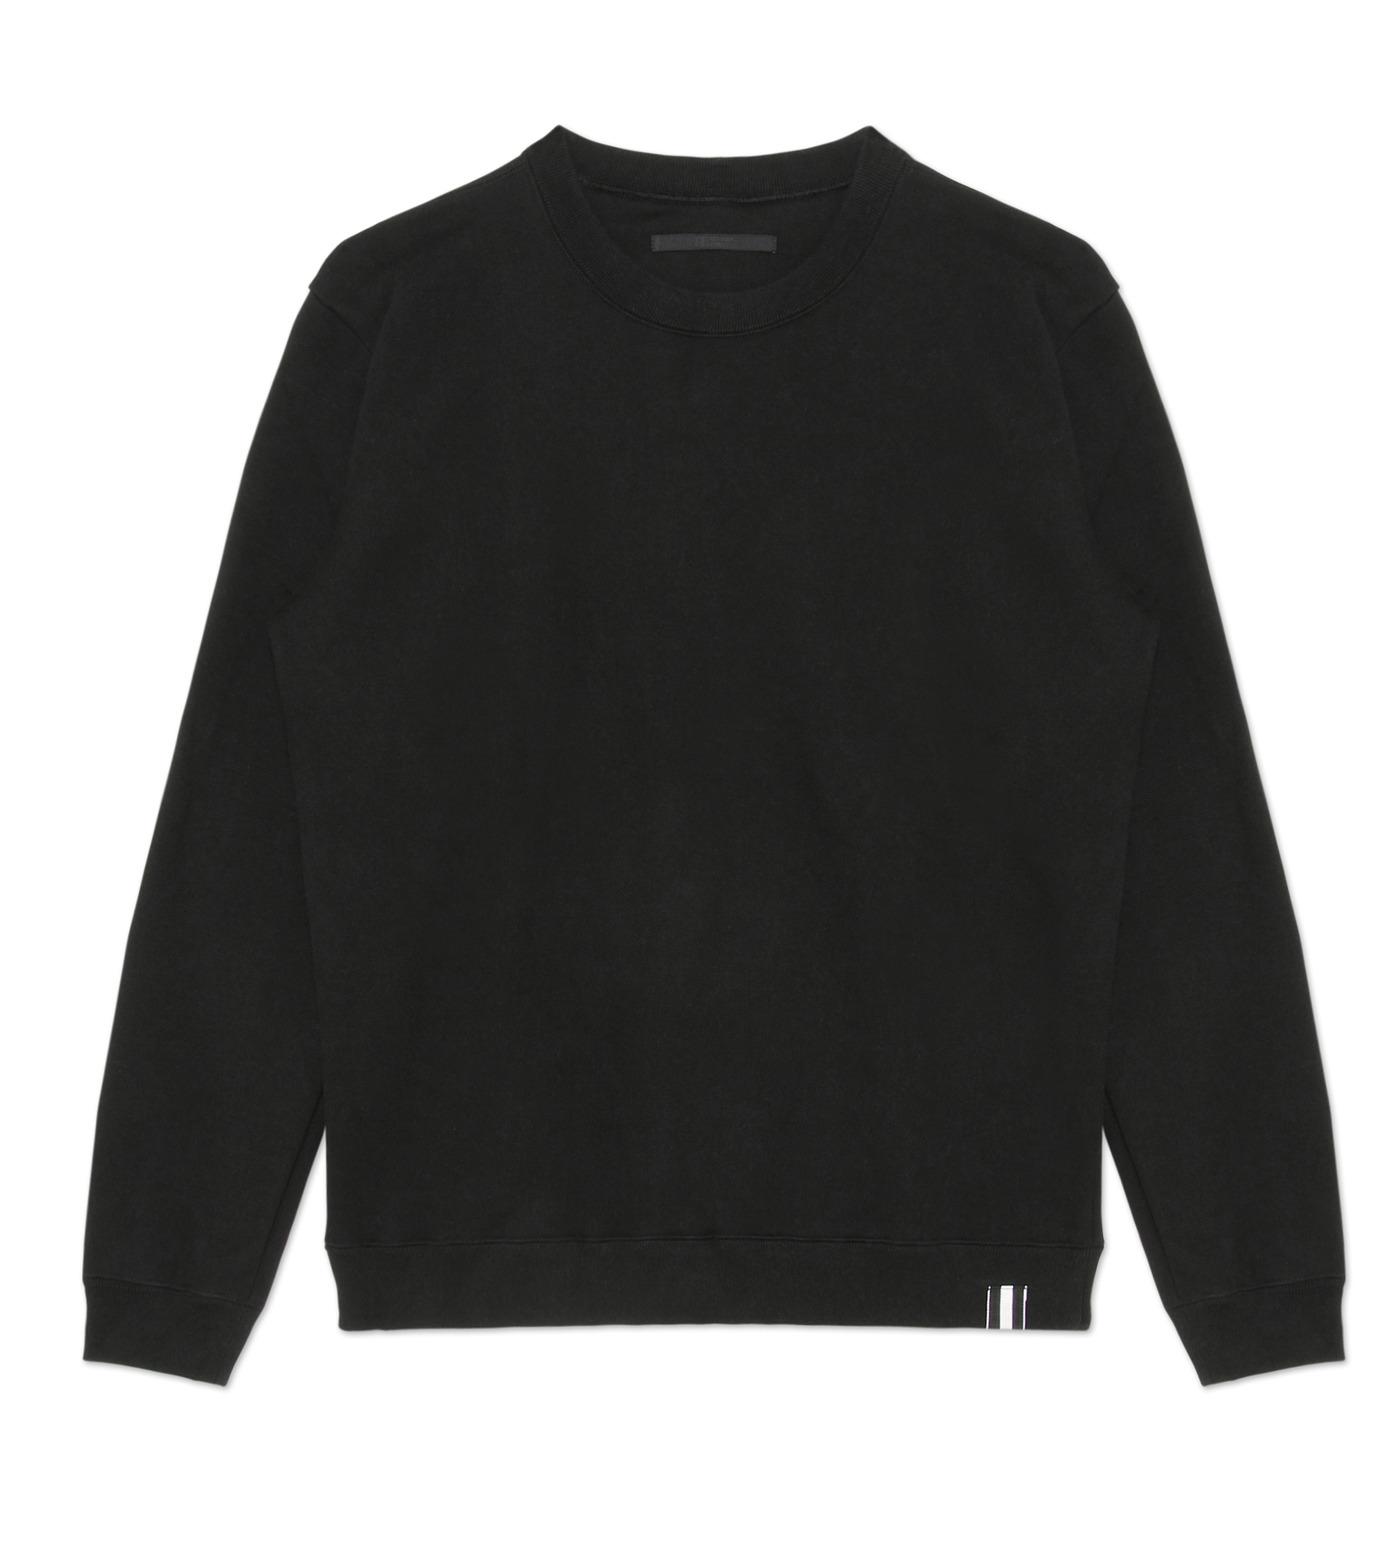 HL HEDDIE LOVU(エイチエル・エディールーヴ)のHEAVY SWEATSHIRT-BLACK(カットソー/cut and sewn)-18S92002-13 拡大詳細画像4